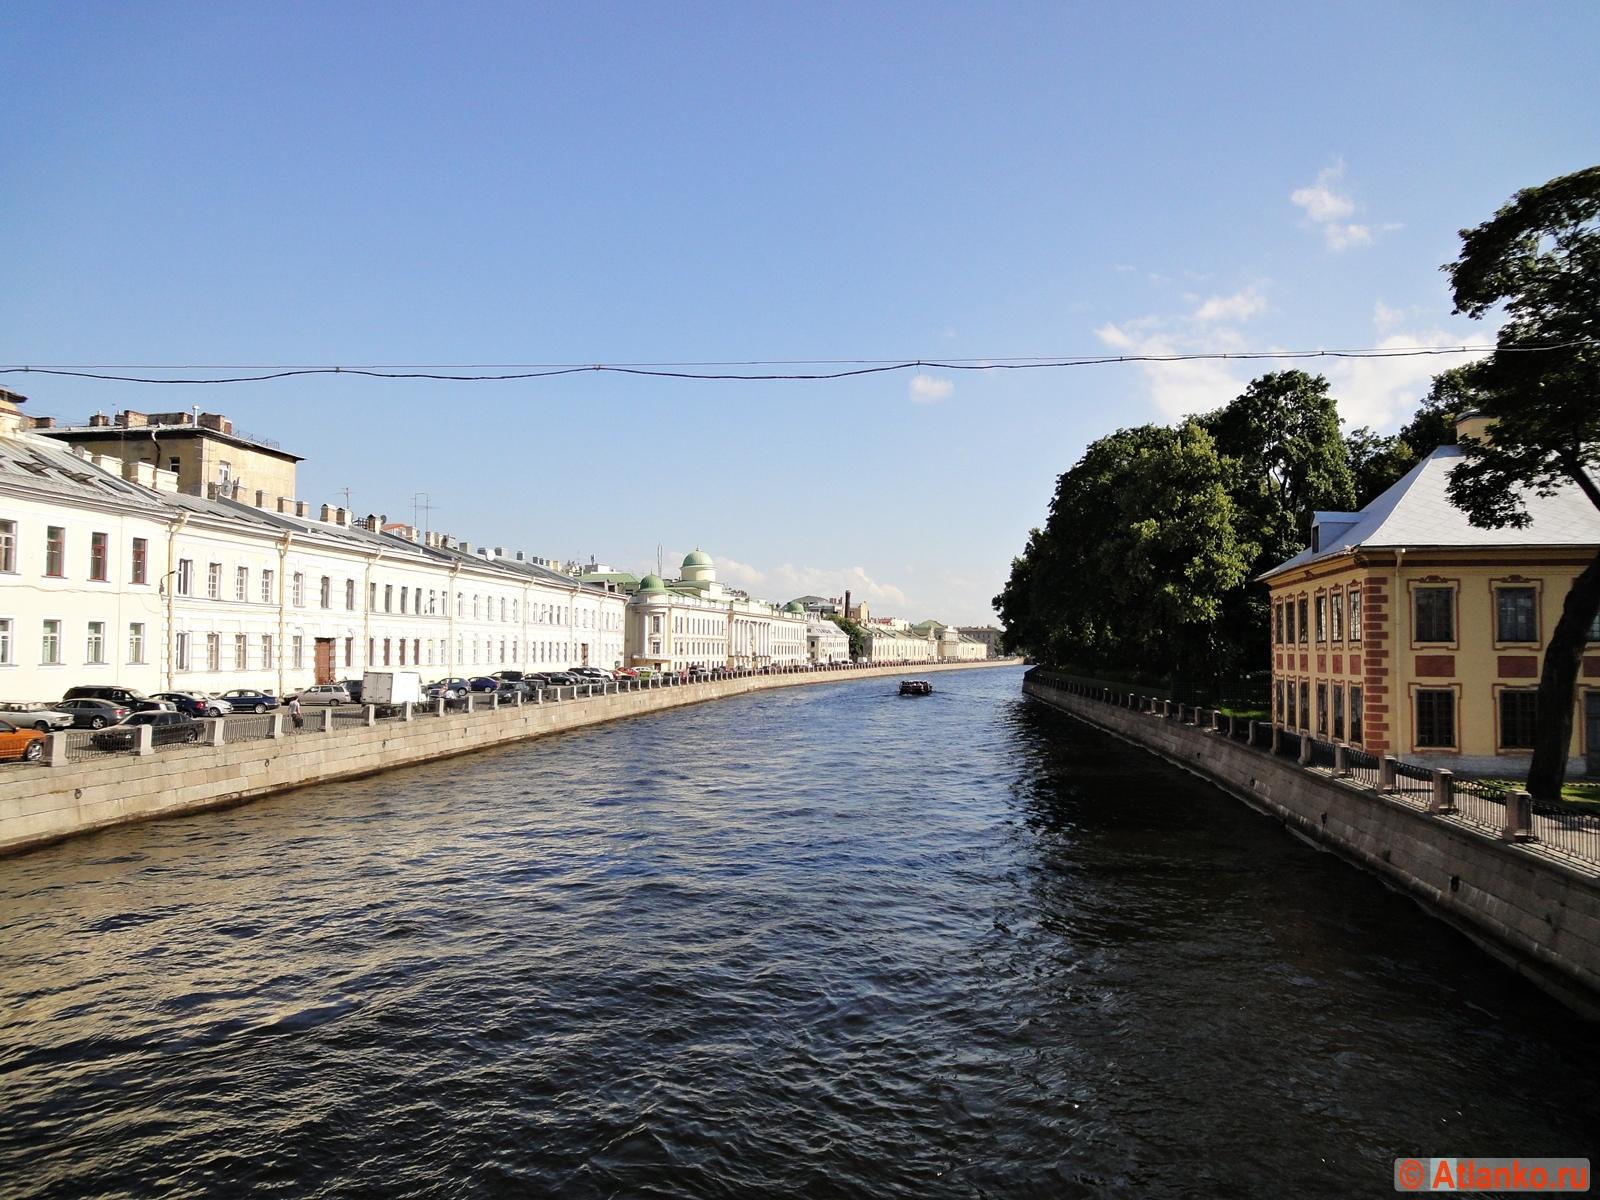 Набережная реки Фонтанки. Летний сад и Летний дворец Петра I. Санкт-Петербург. Фотография